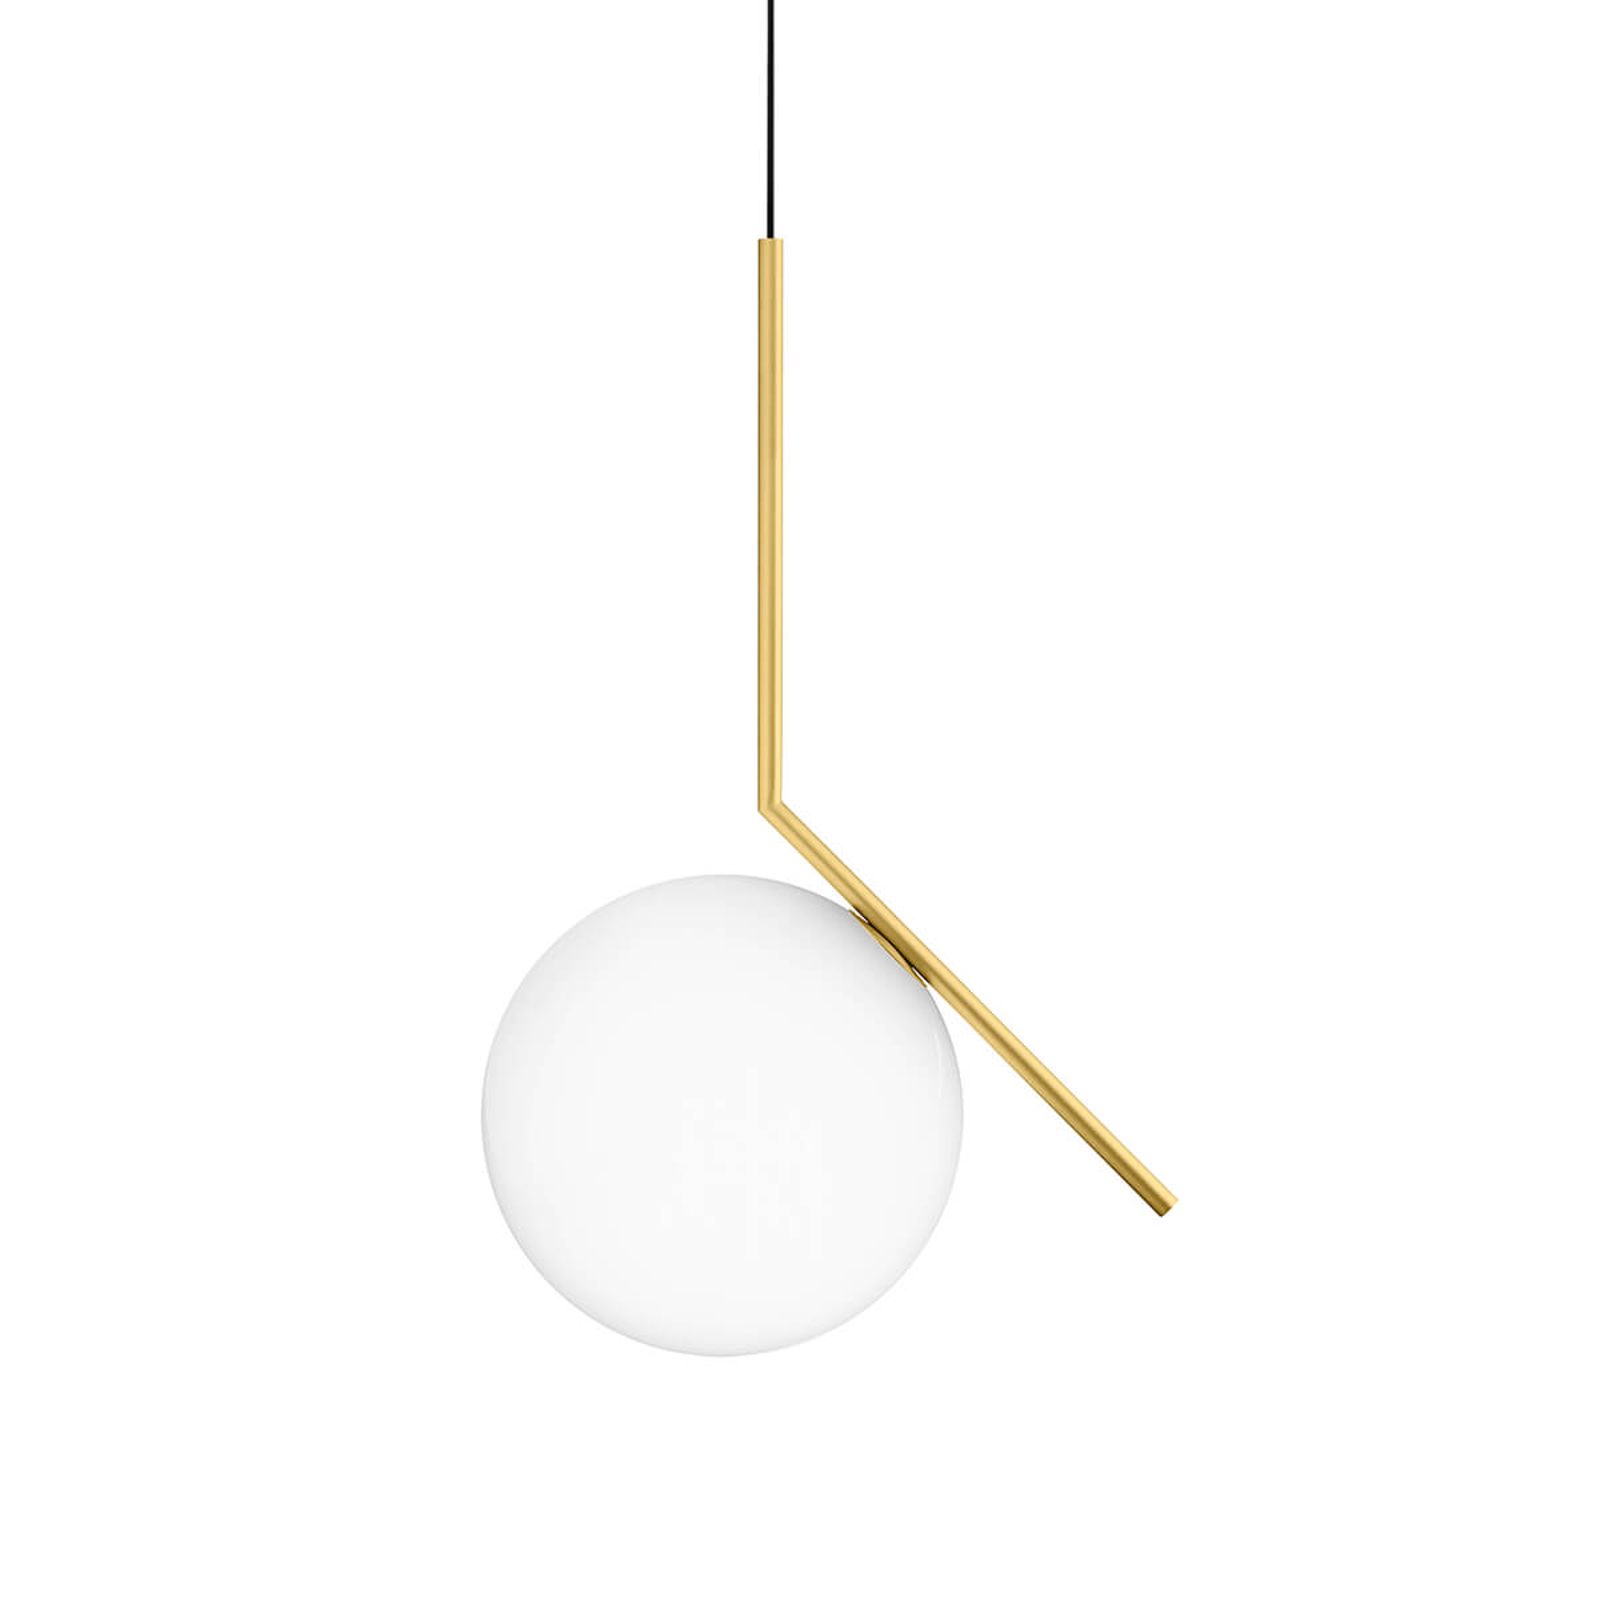 IC S2 designerska lampa wisząca marki FLOS